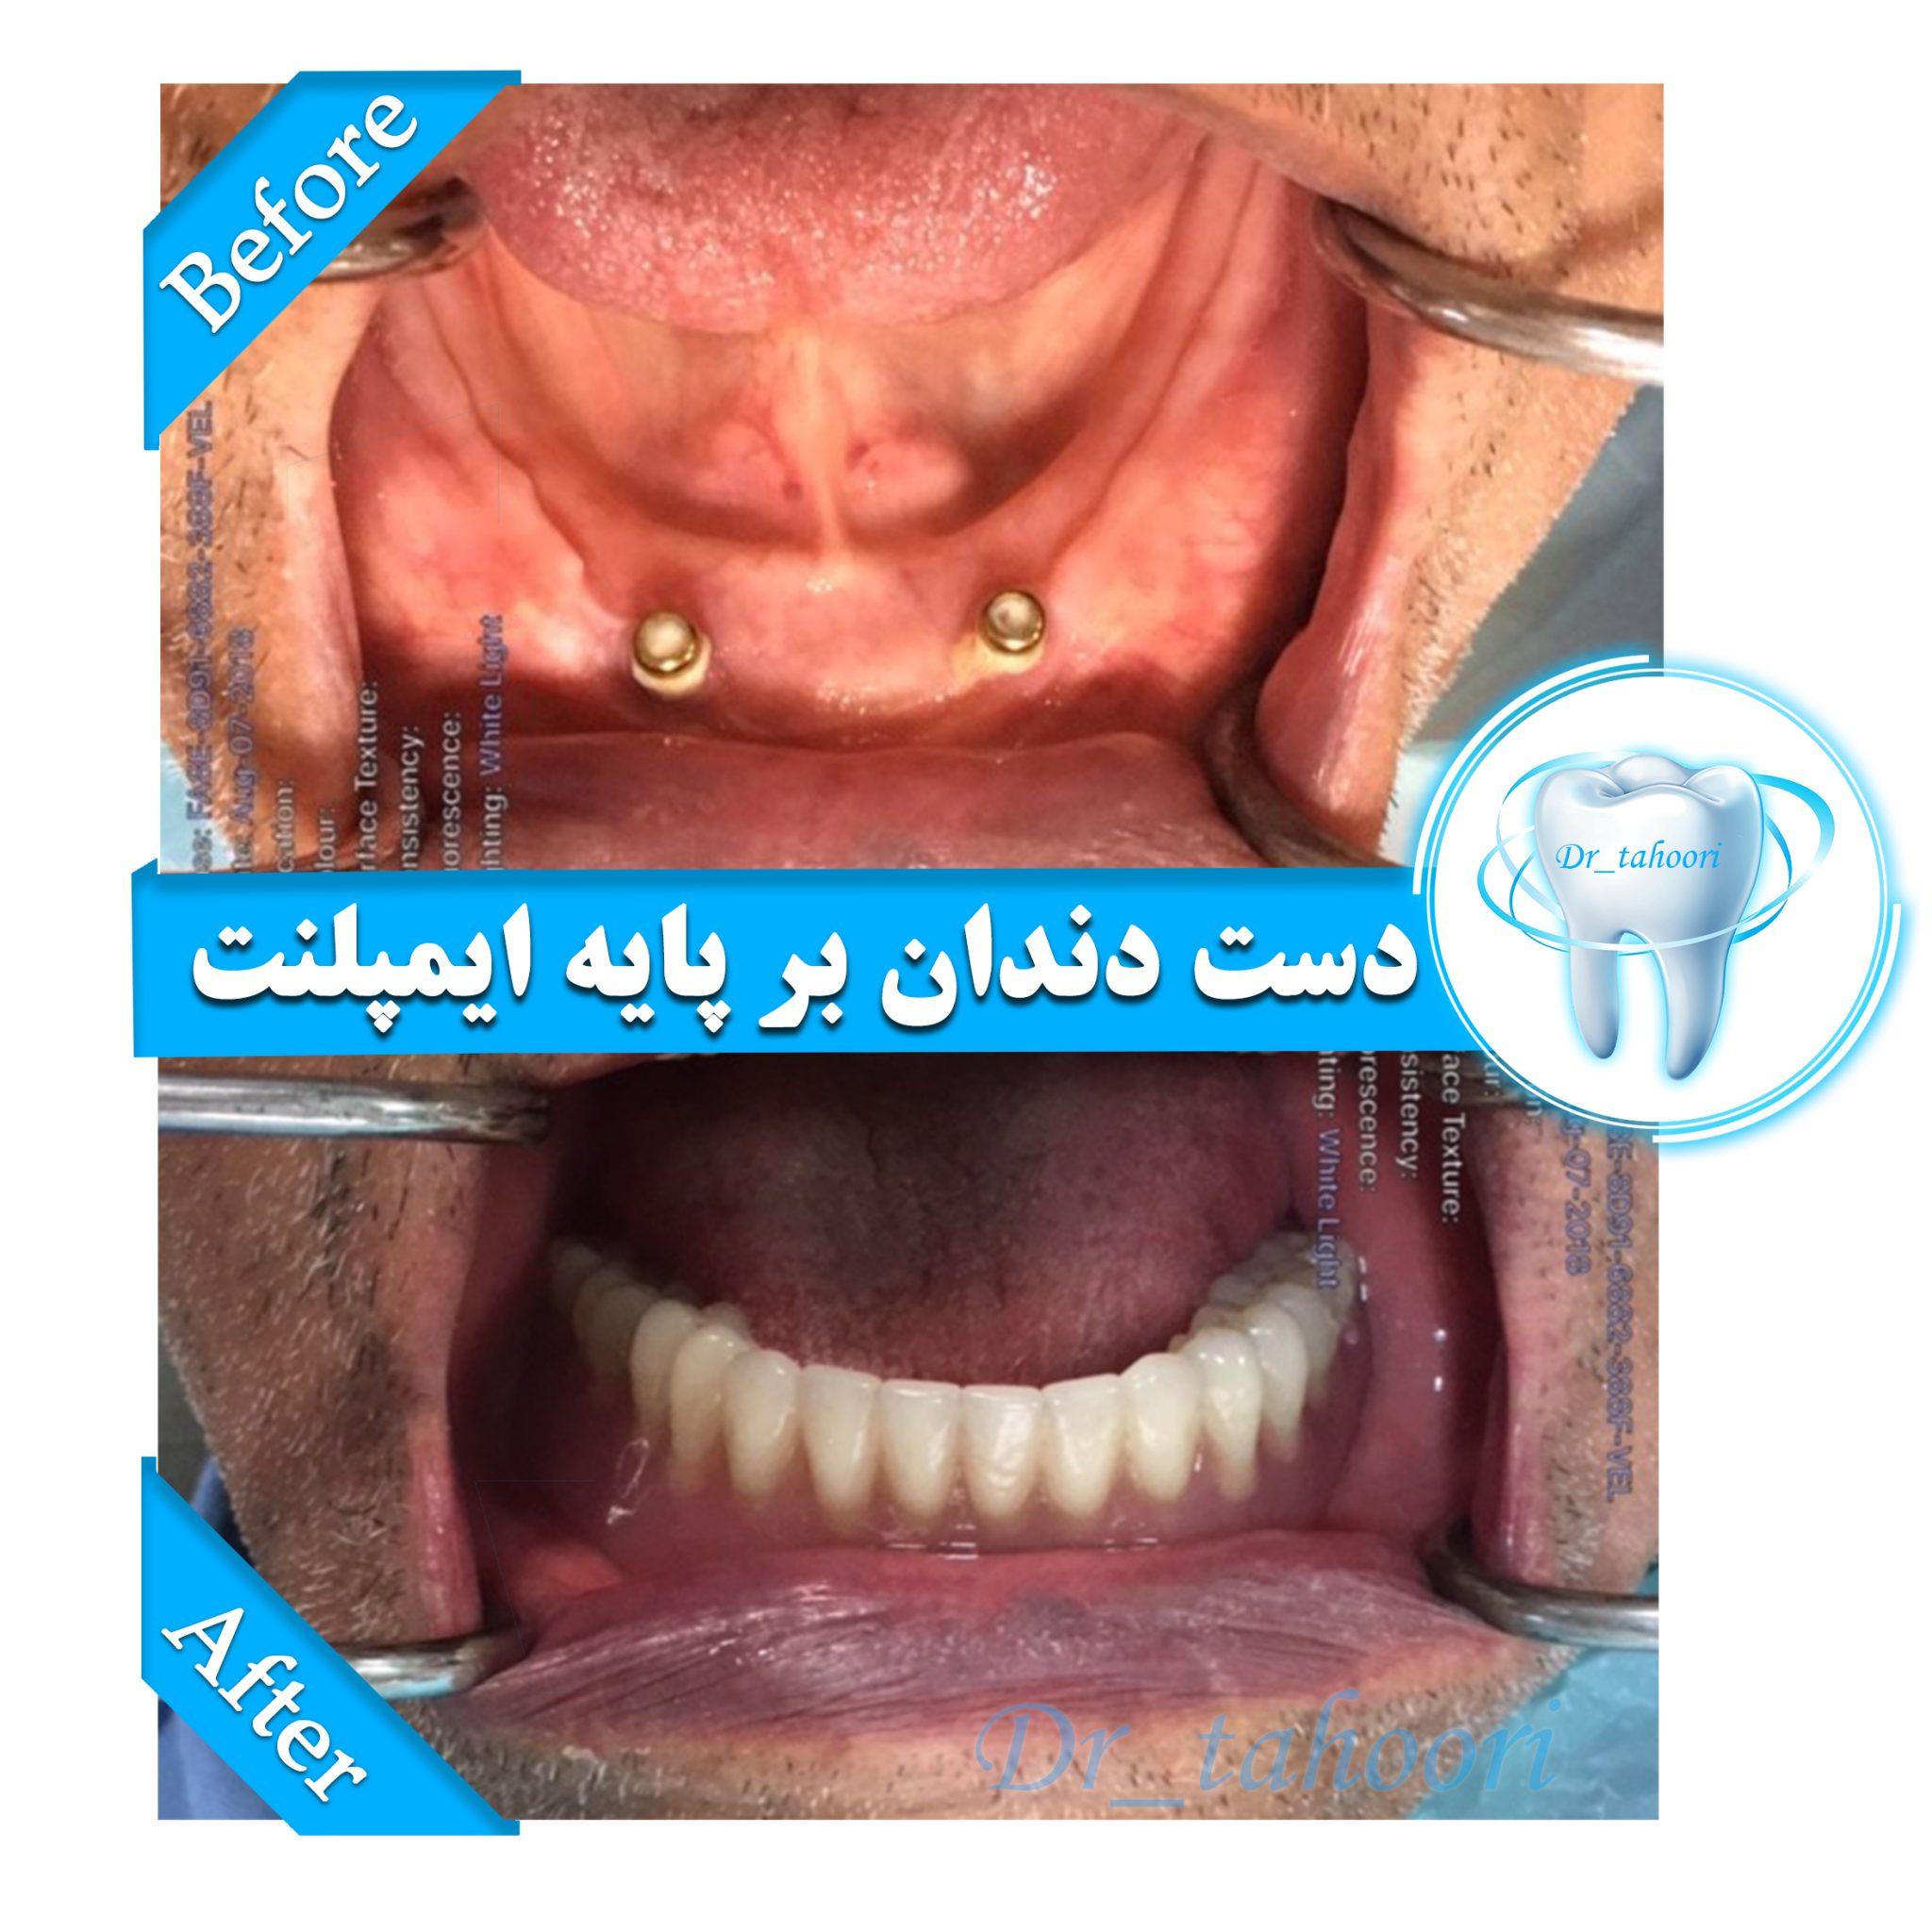 اوردنچر دندانها یا دست دندان بر پایه ایمپلنت